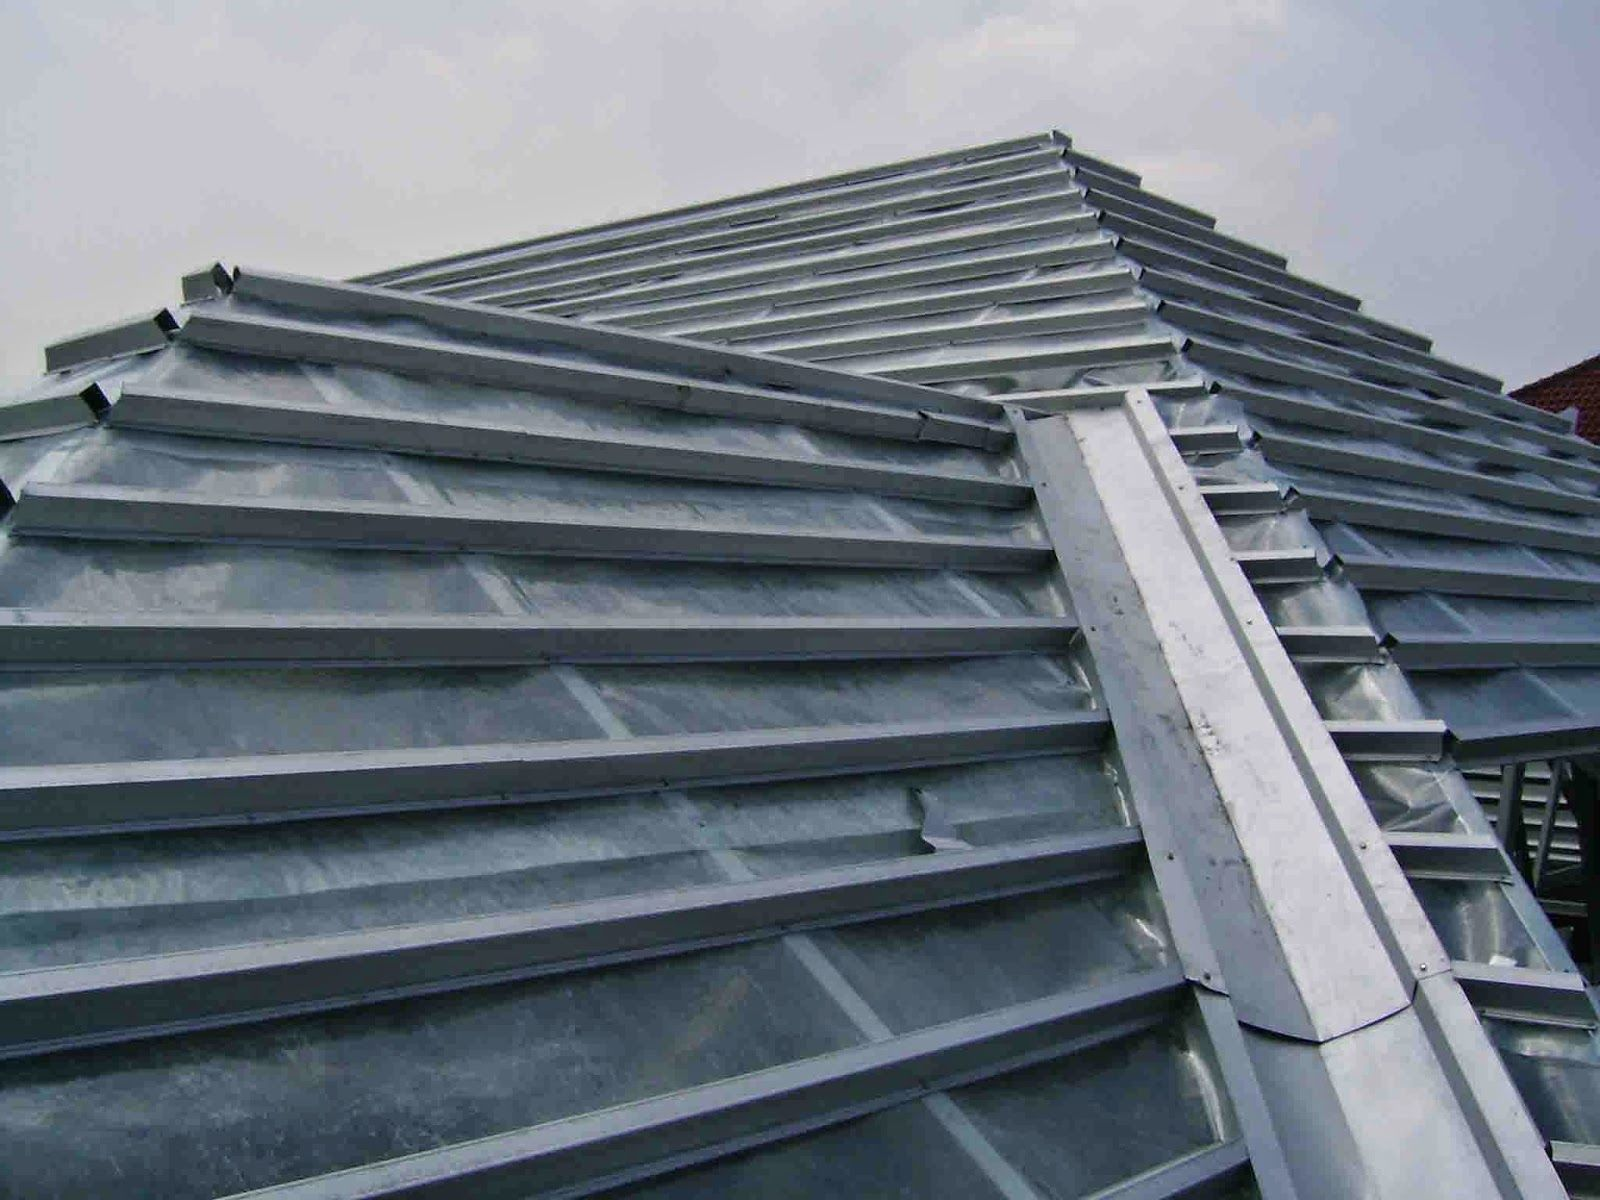 Rangka Atap Baja Ringan Murah Jakarta Butuh Jasa Pemasangan Berkualitas